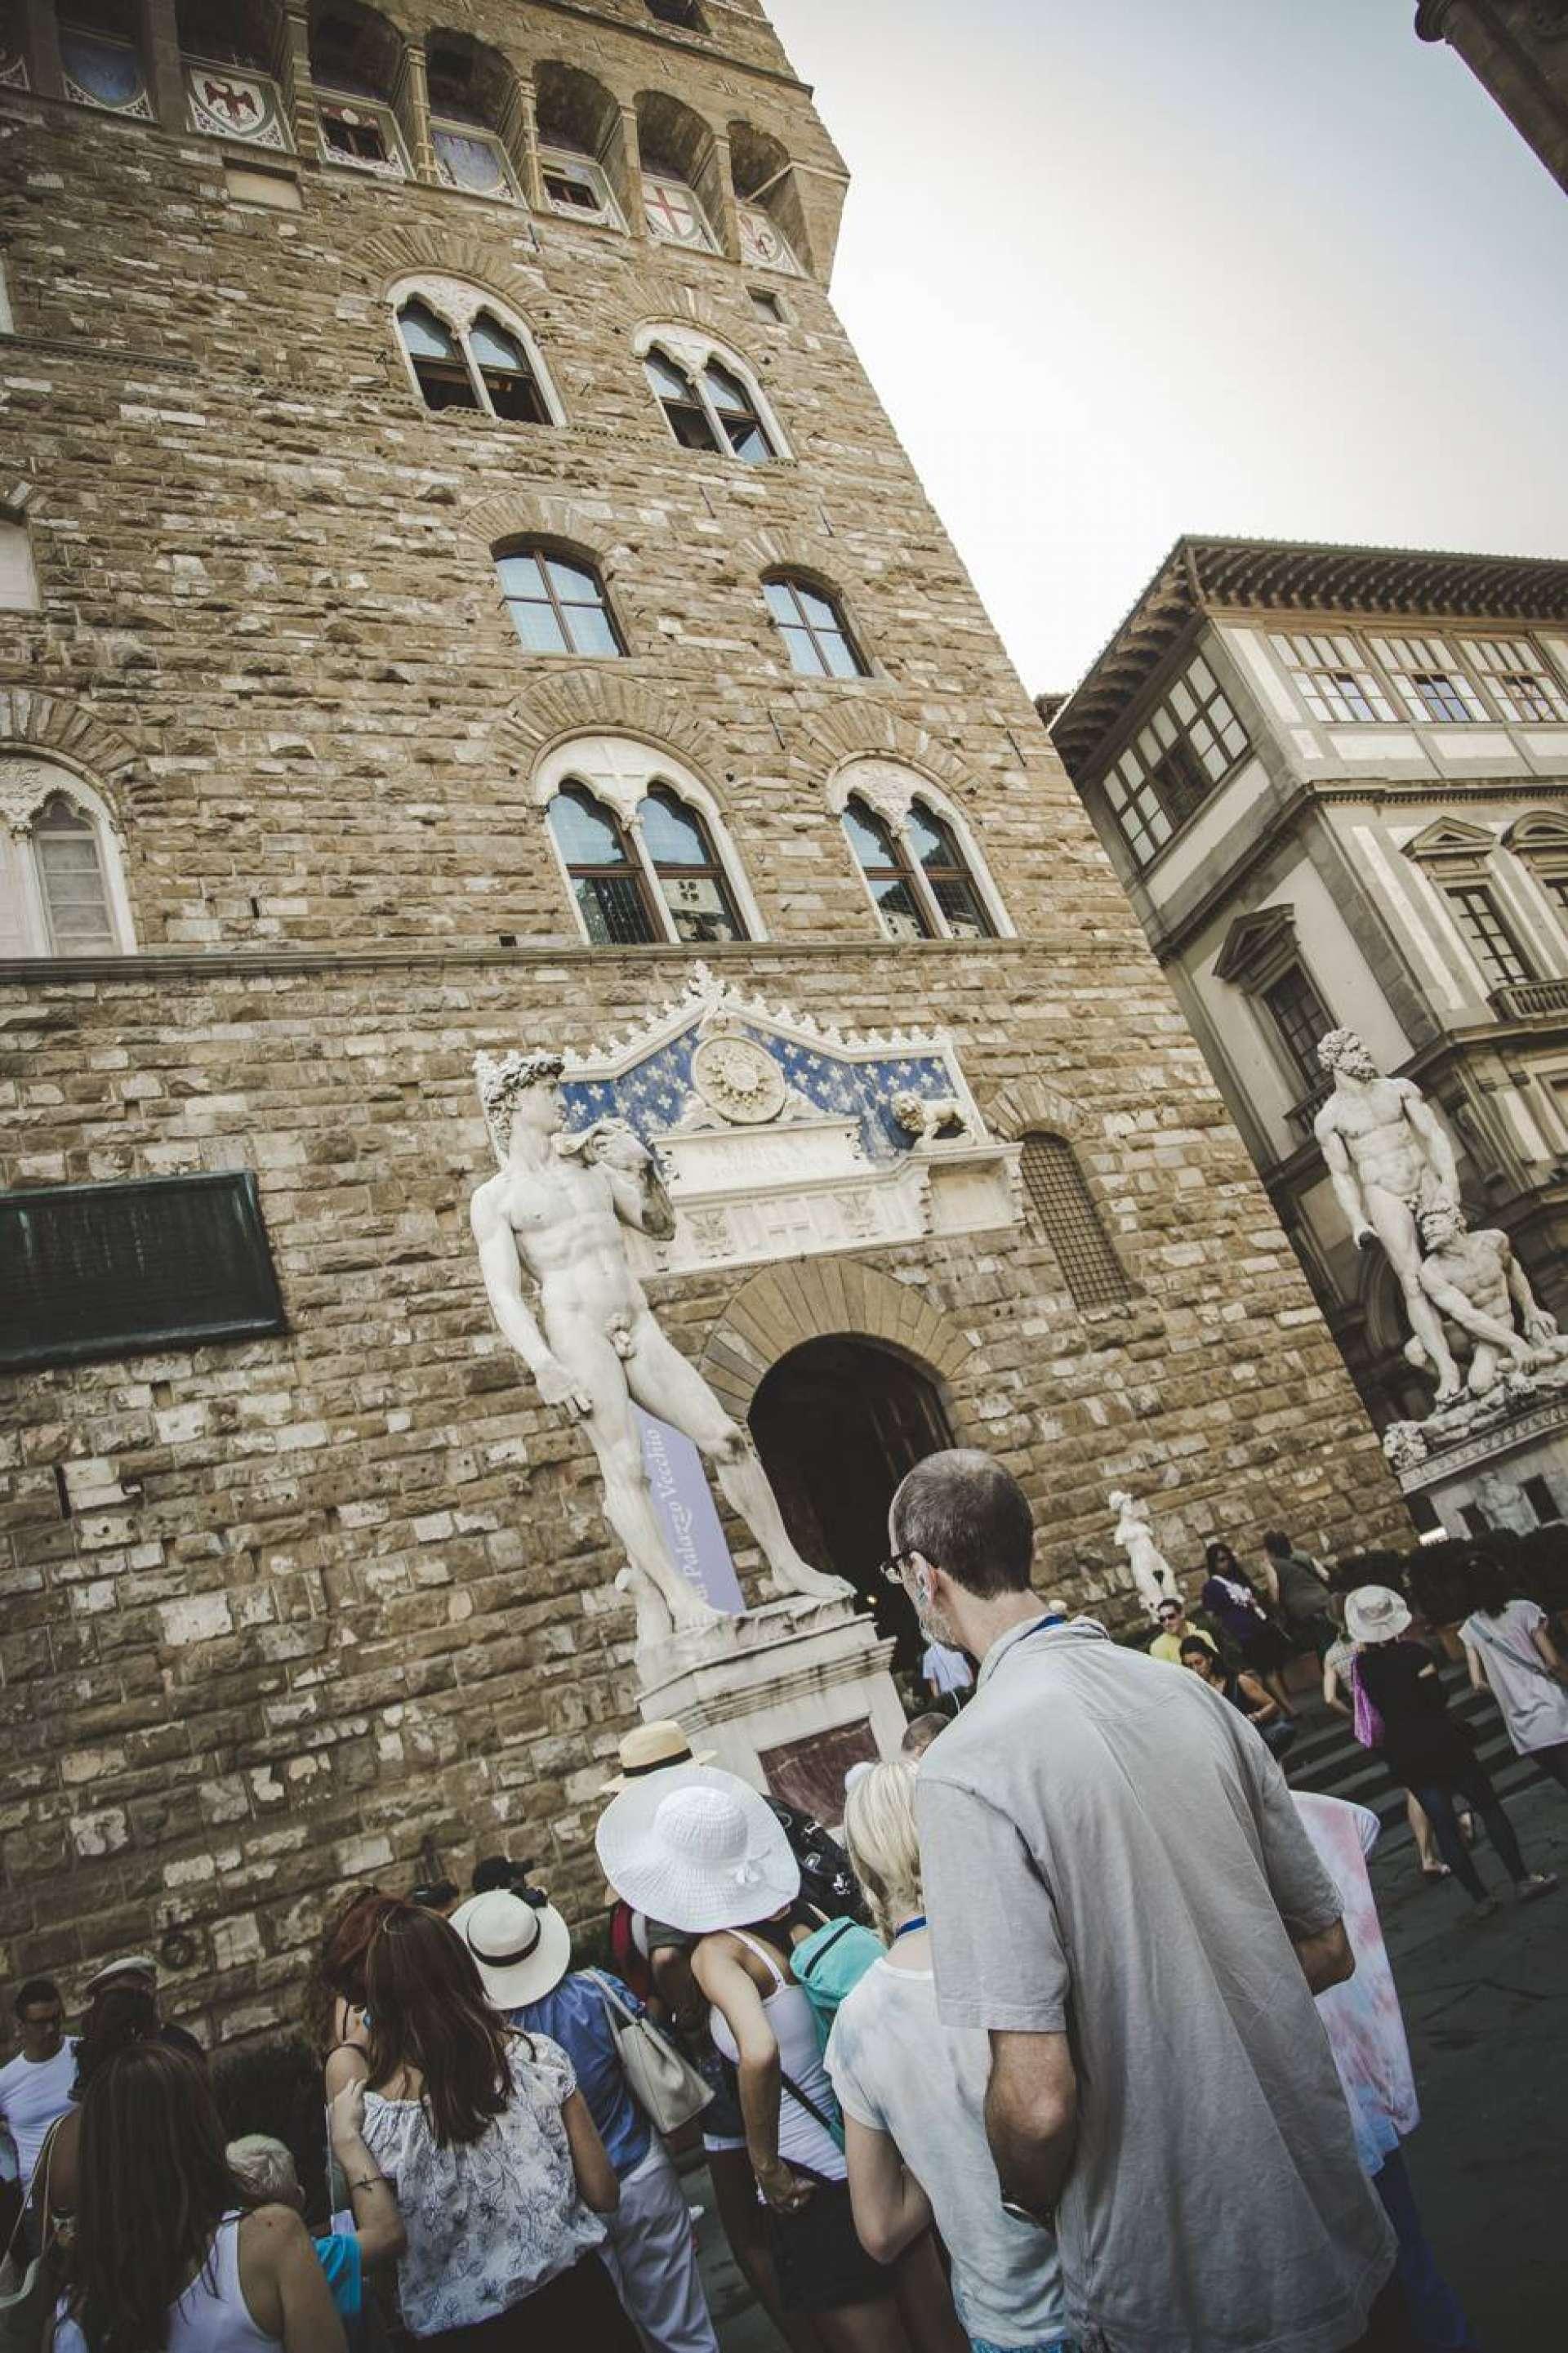 Uffizi & Florentine Squares